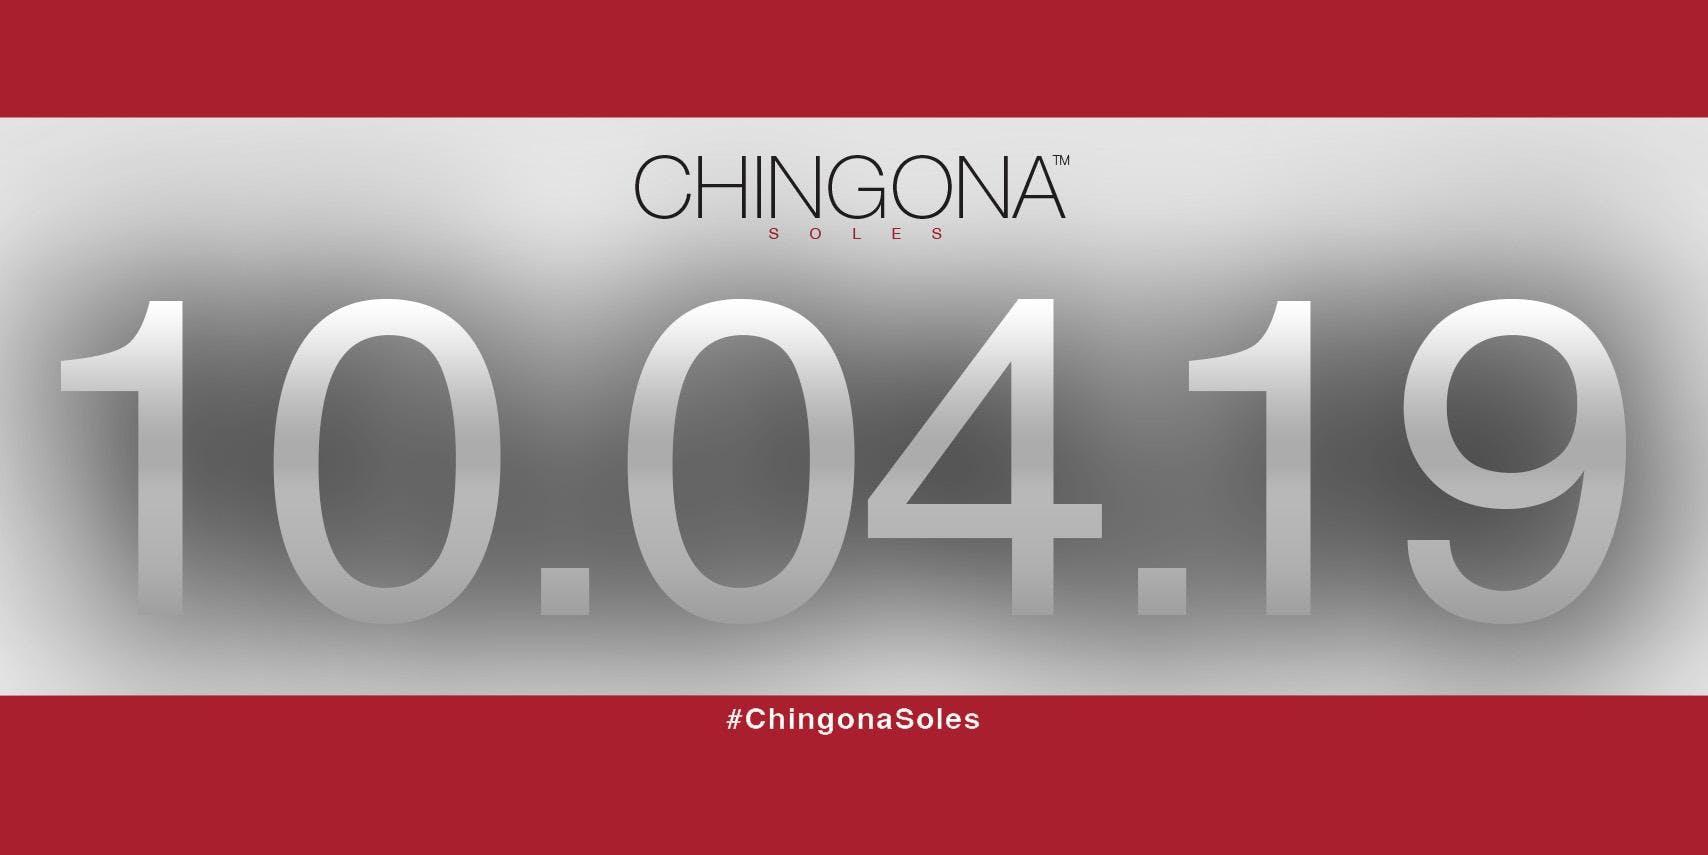 Chingona Soles